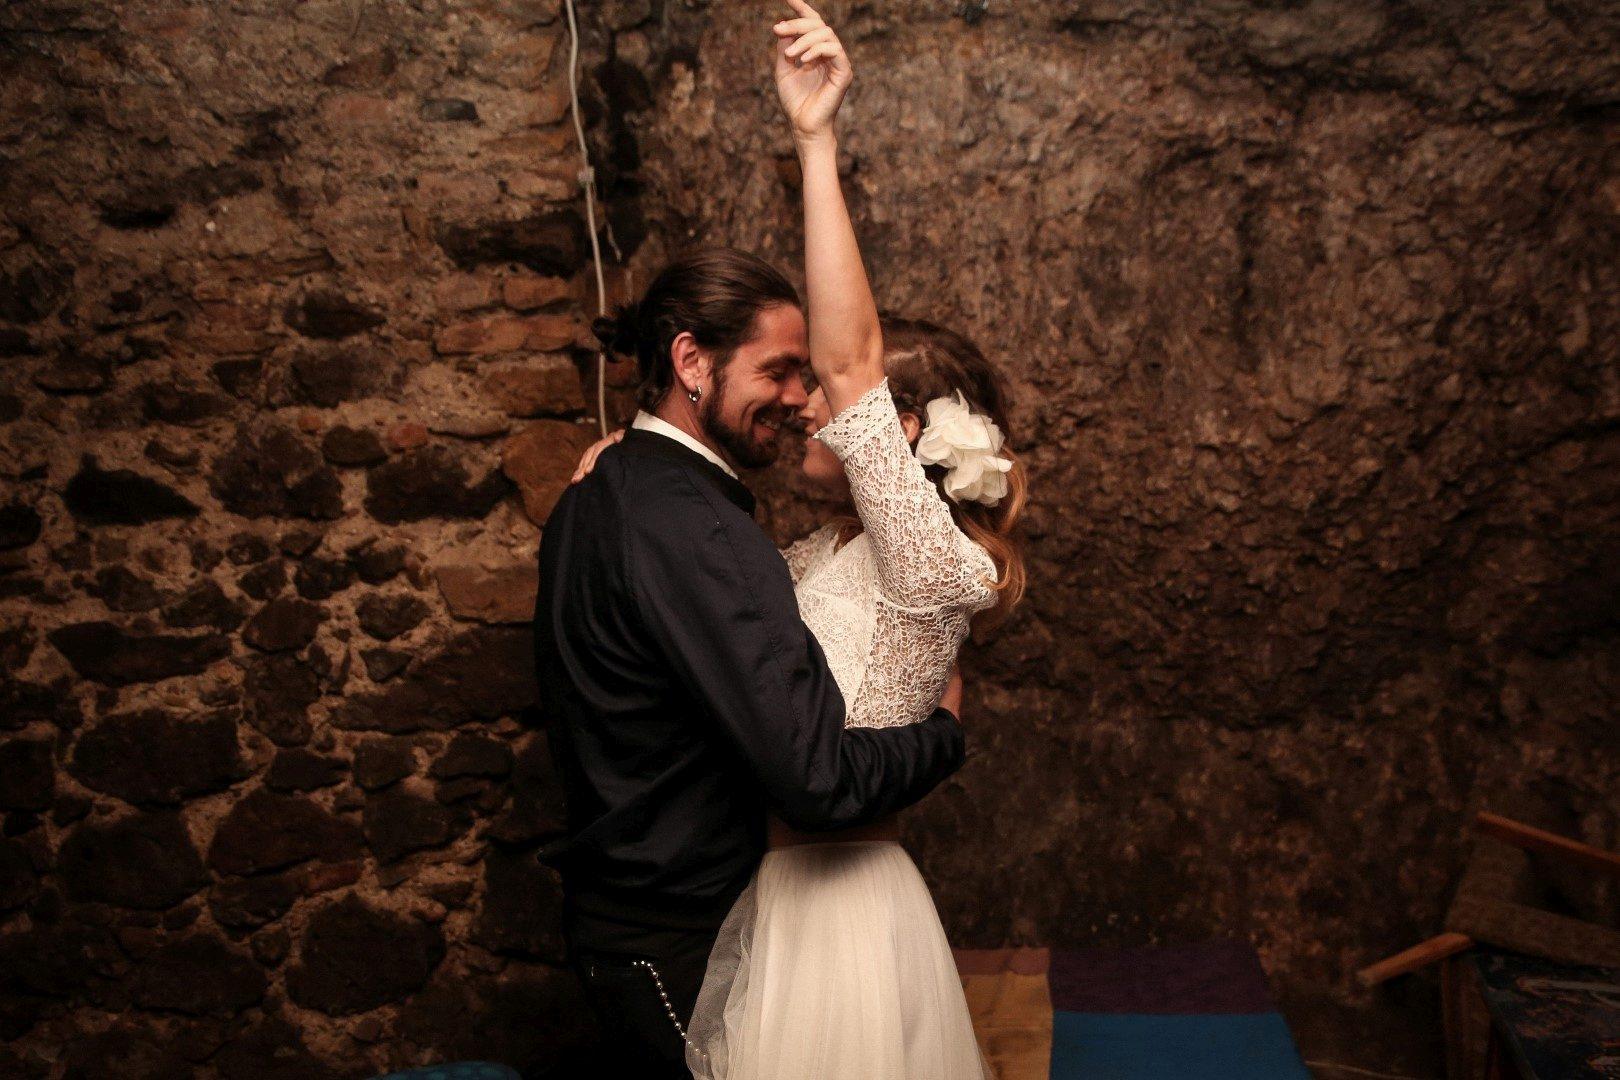 ,valódi esküvő,daalarna ruha,daalarna ruhás esküvő,sophie tarr,nagy viktor,esküvő,varga zorán,